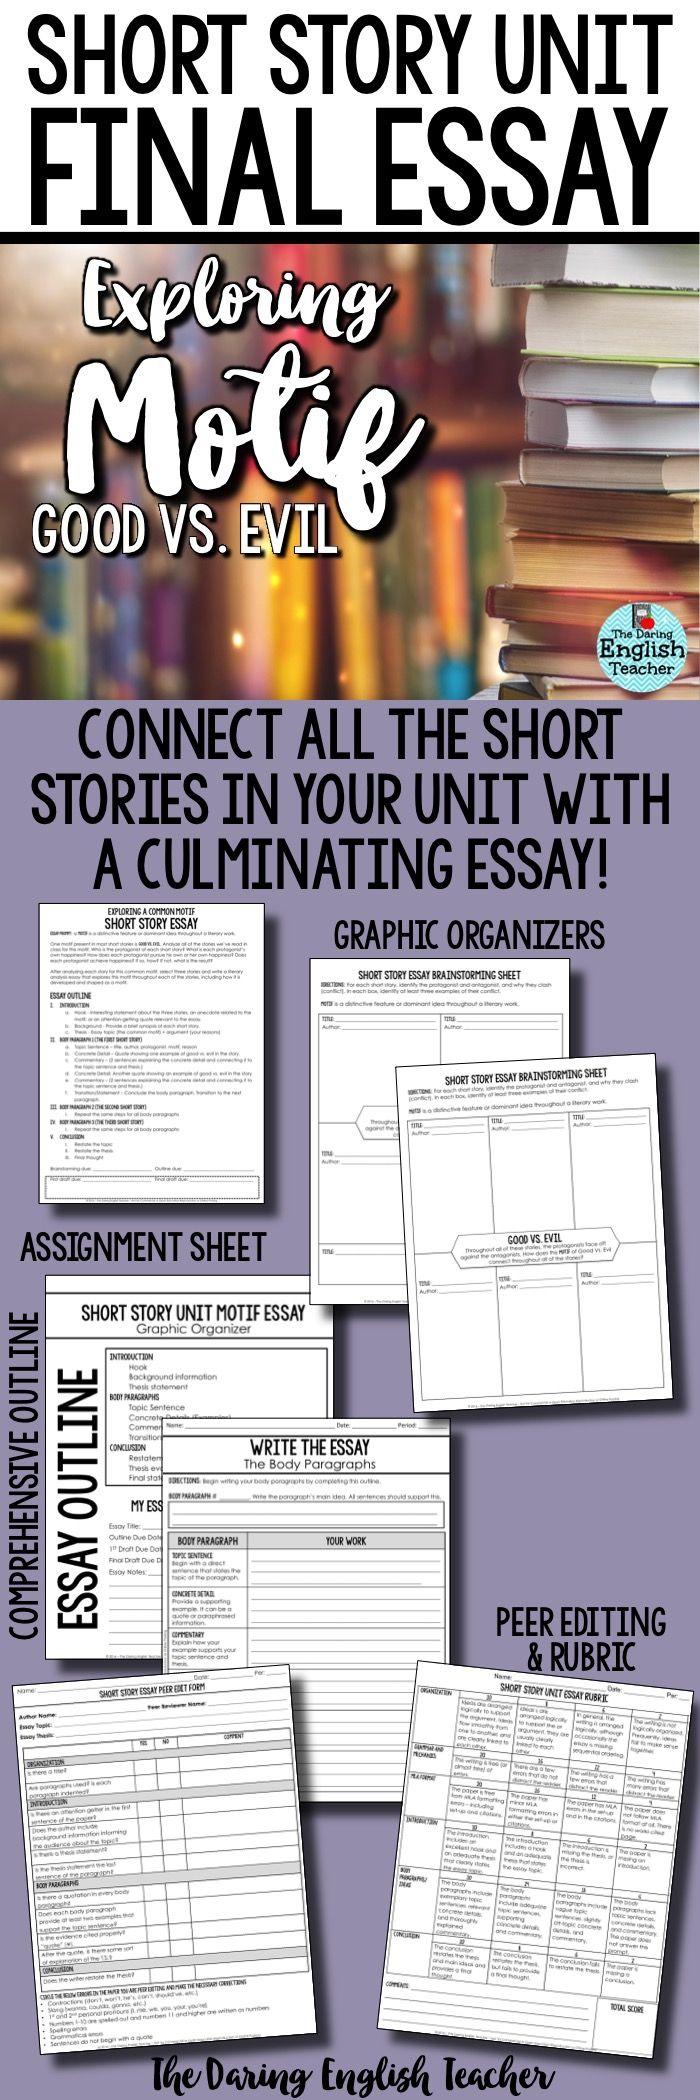 Gathering research data paper cja 334